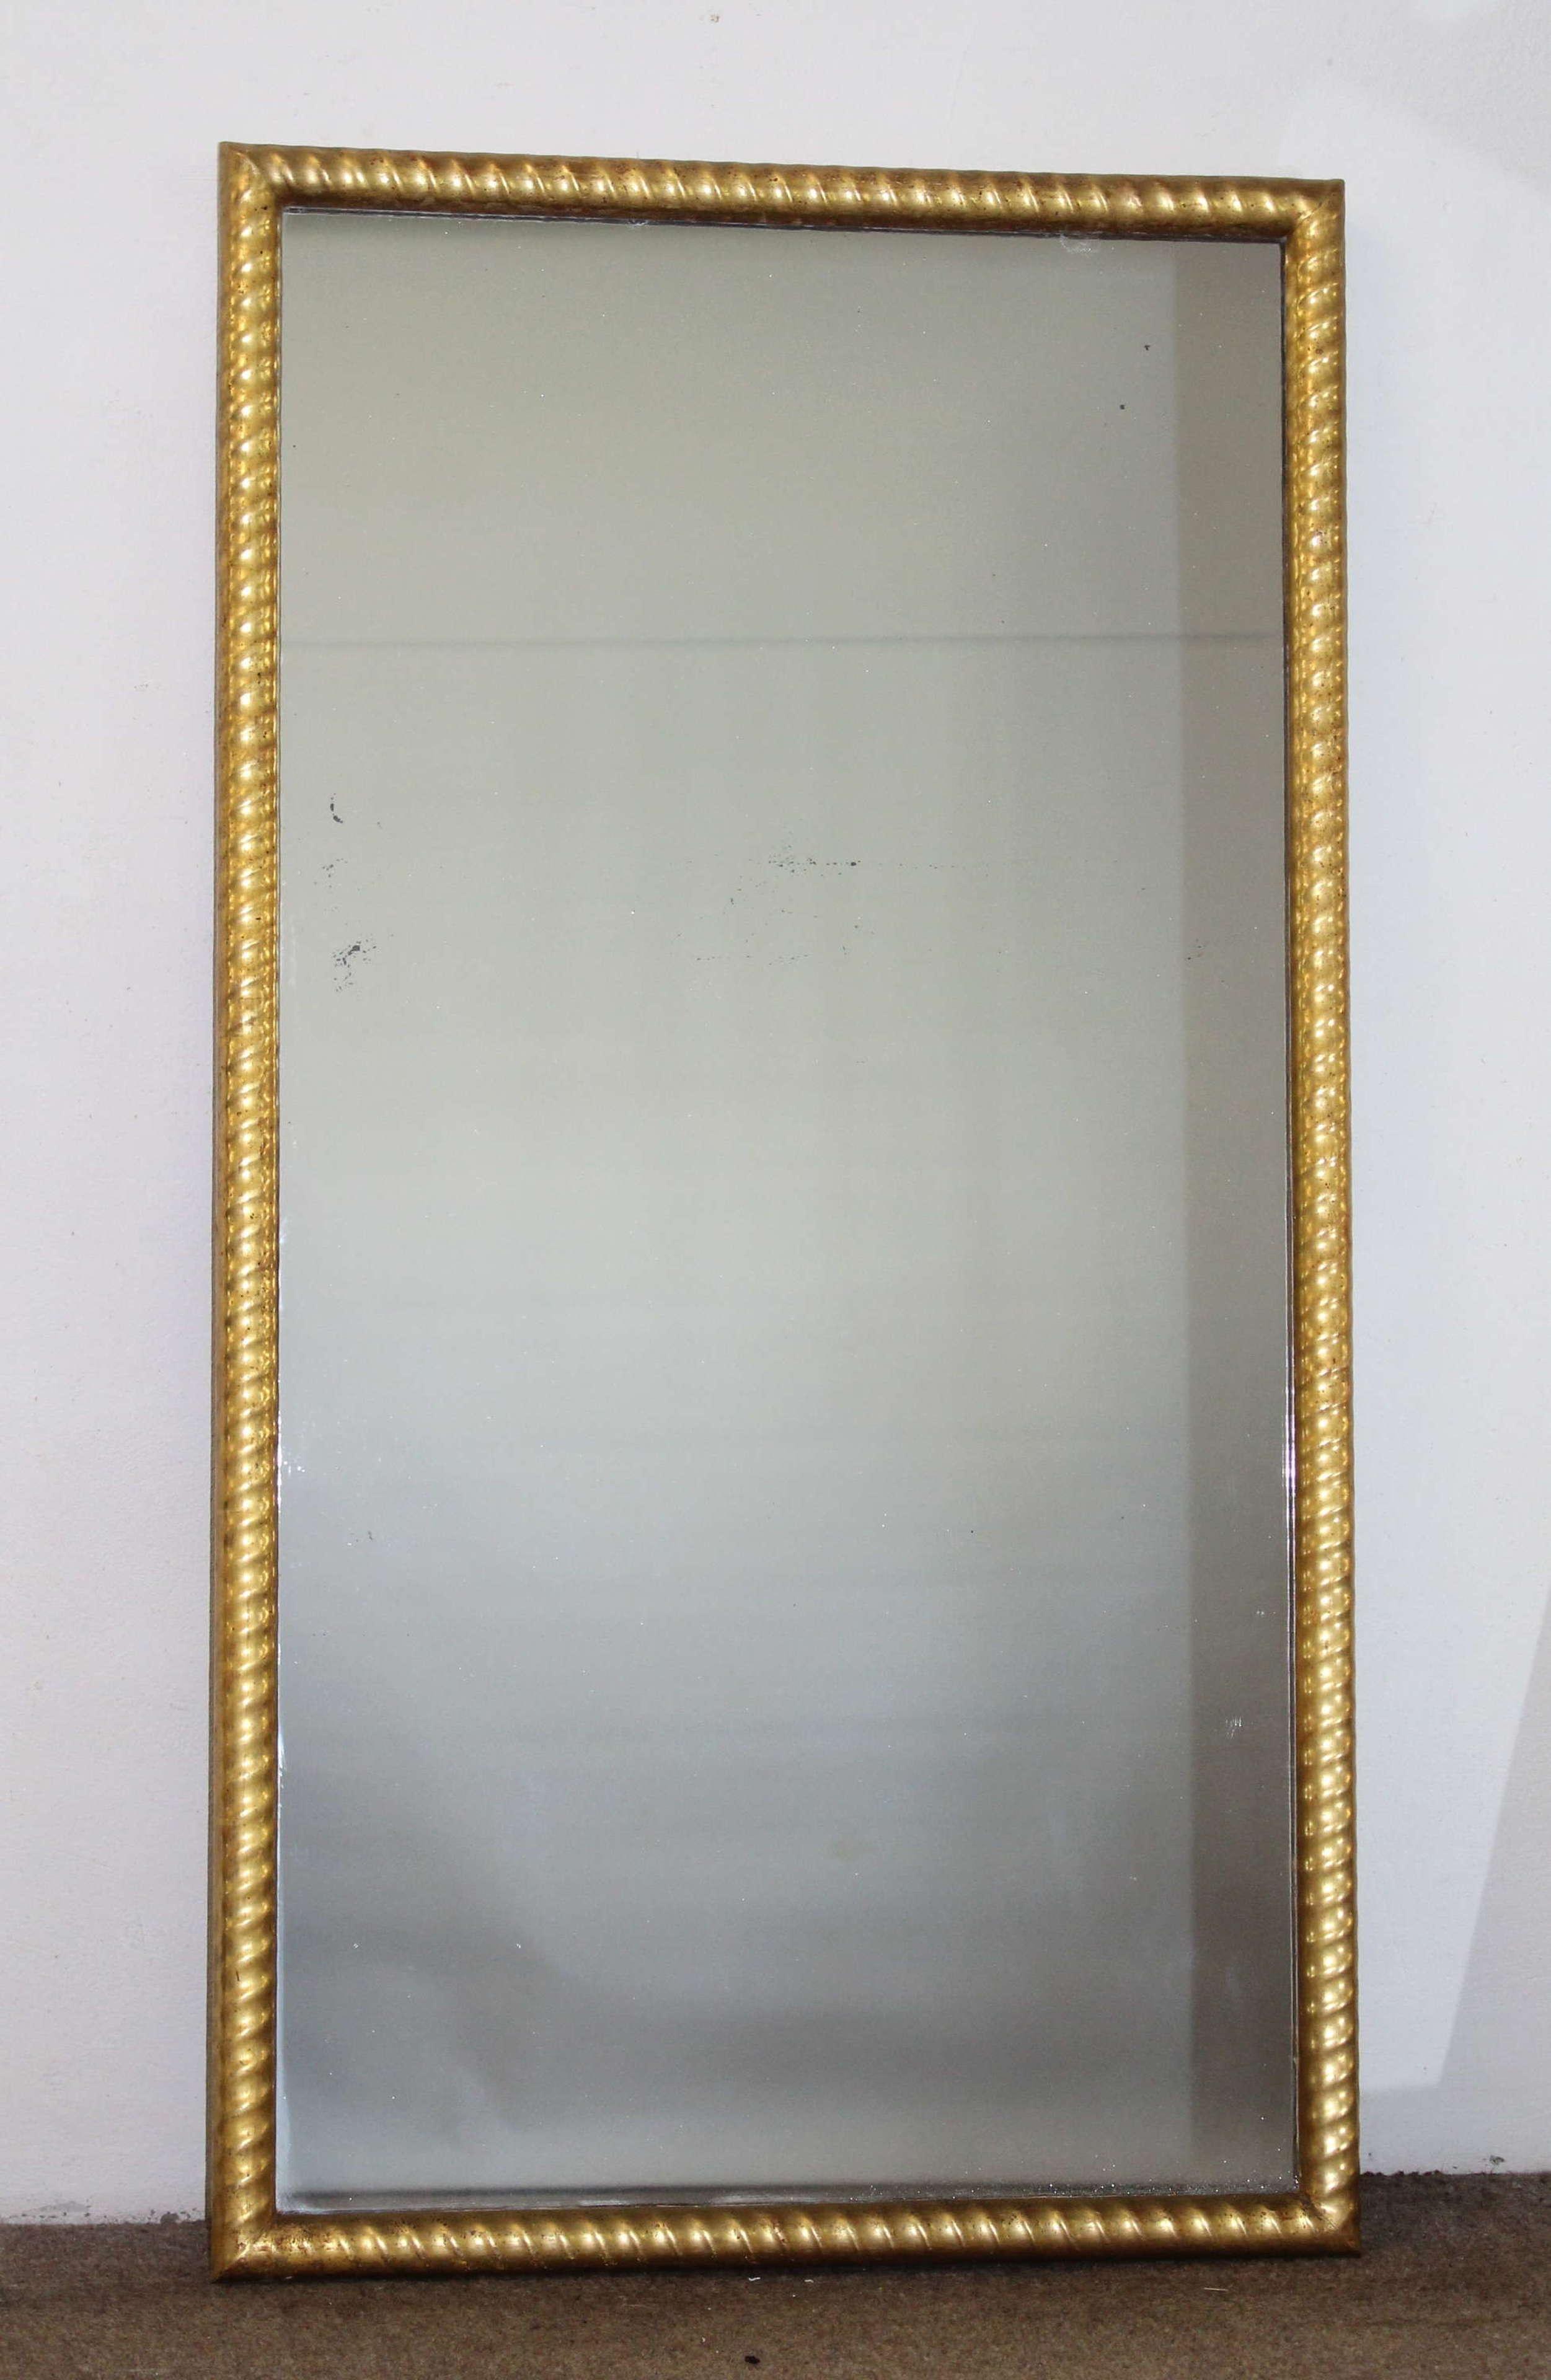 Antique French gilt ropetwist framed mirror